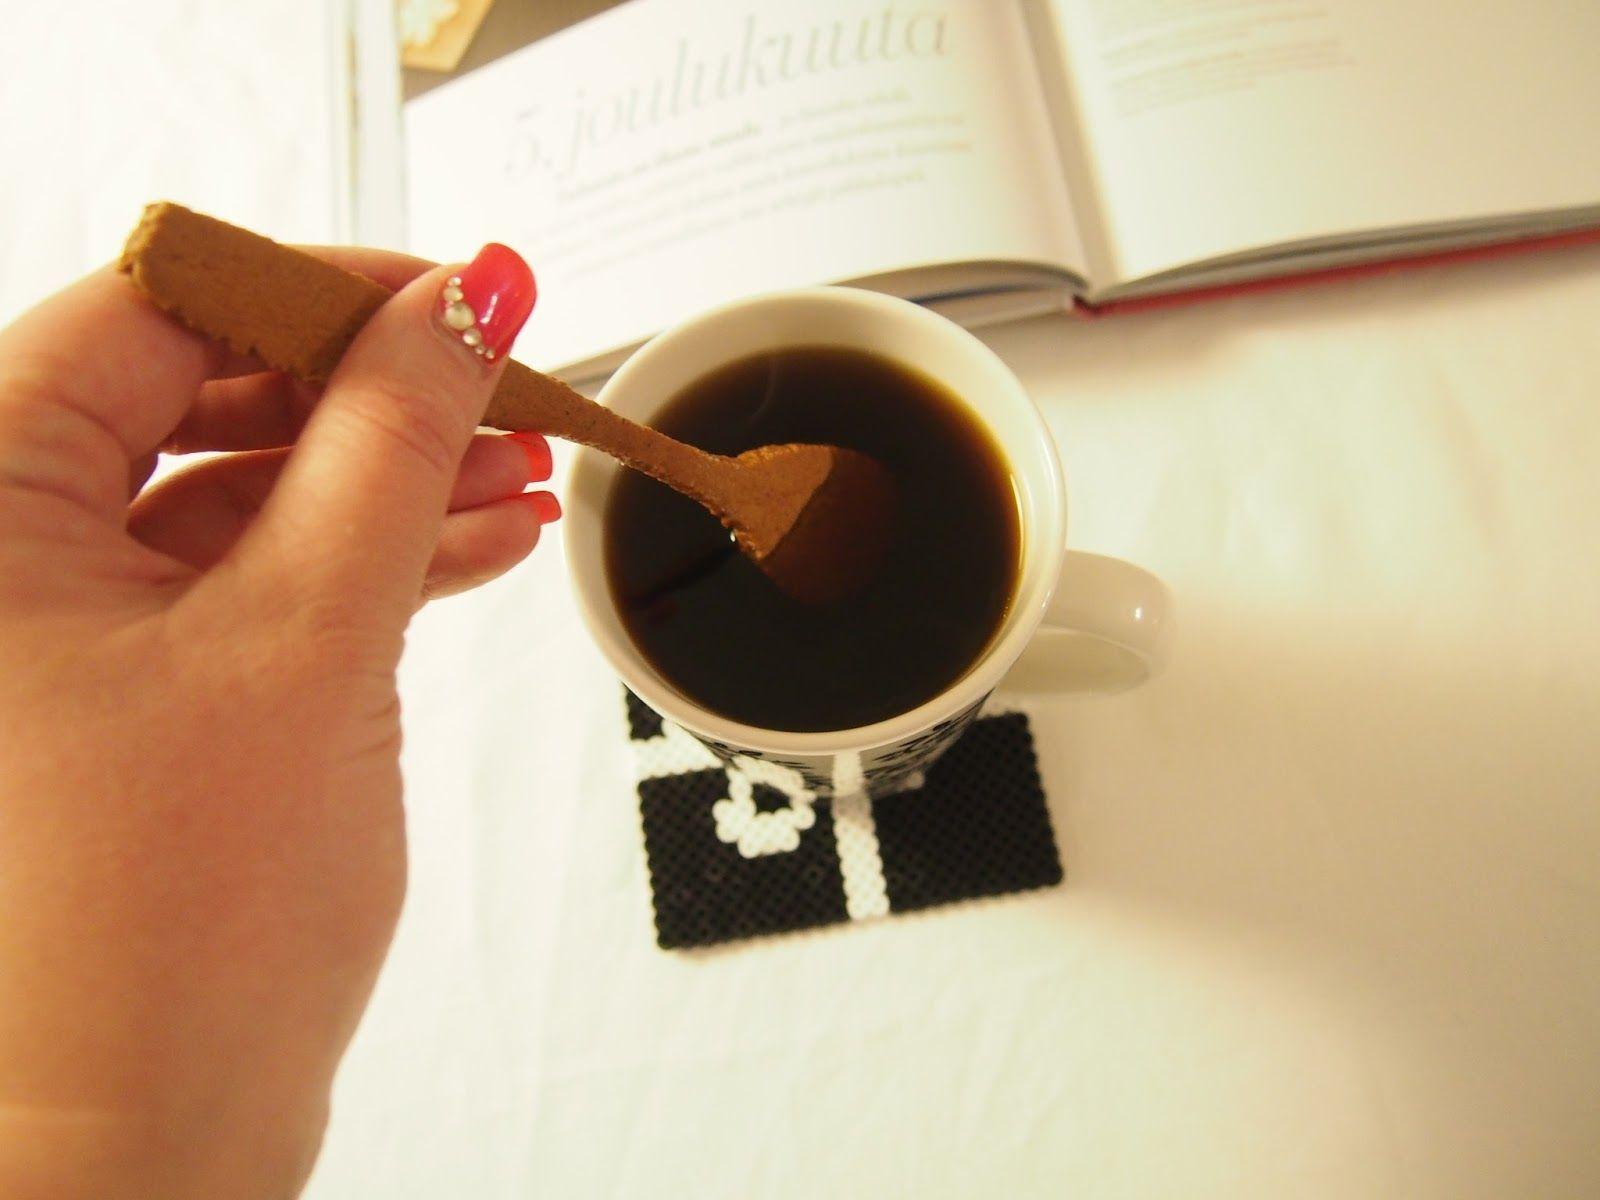 Coffee spoon shaped gingerbread